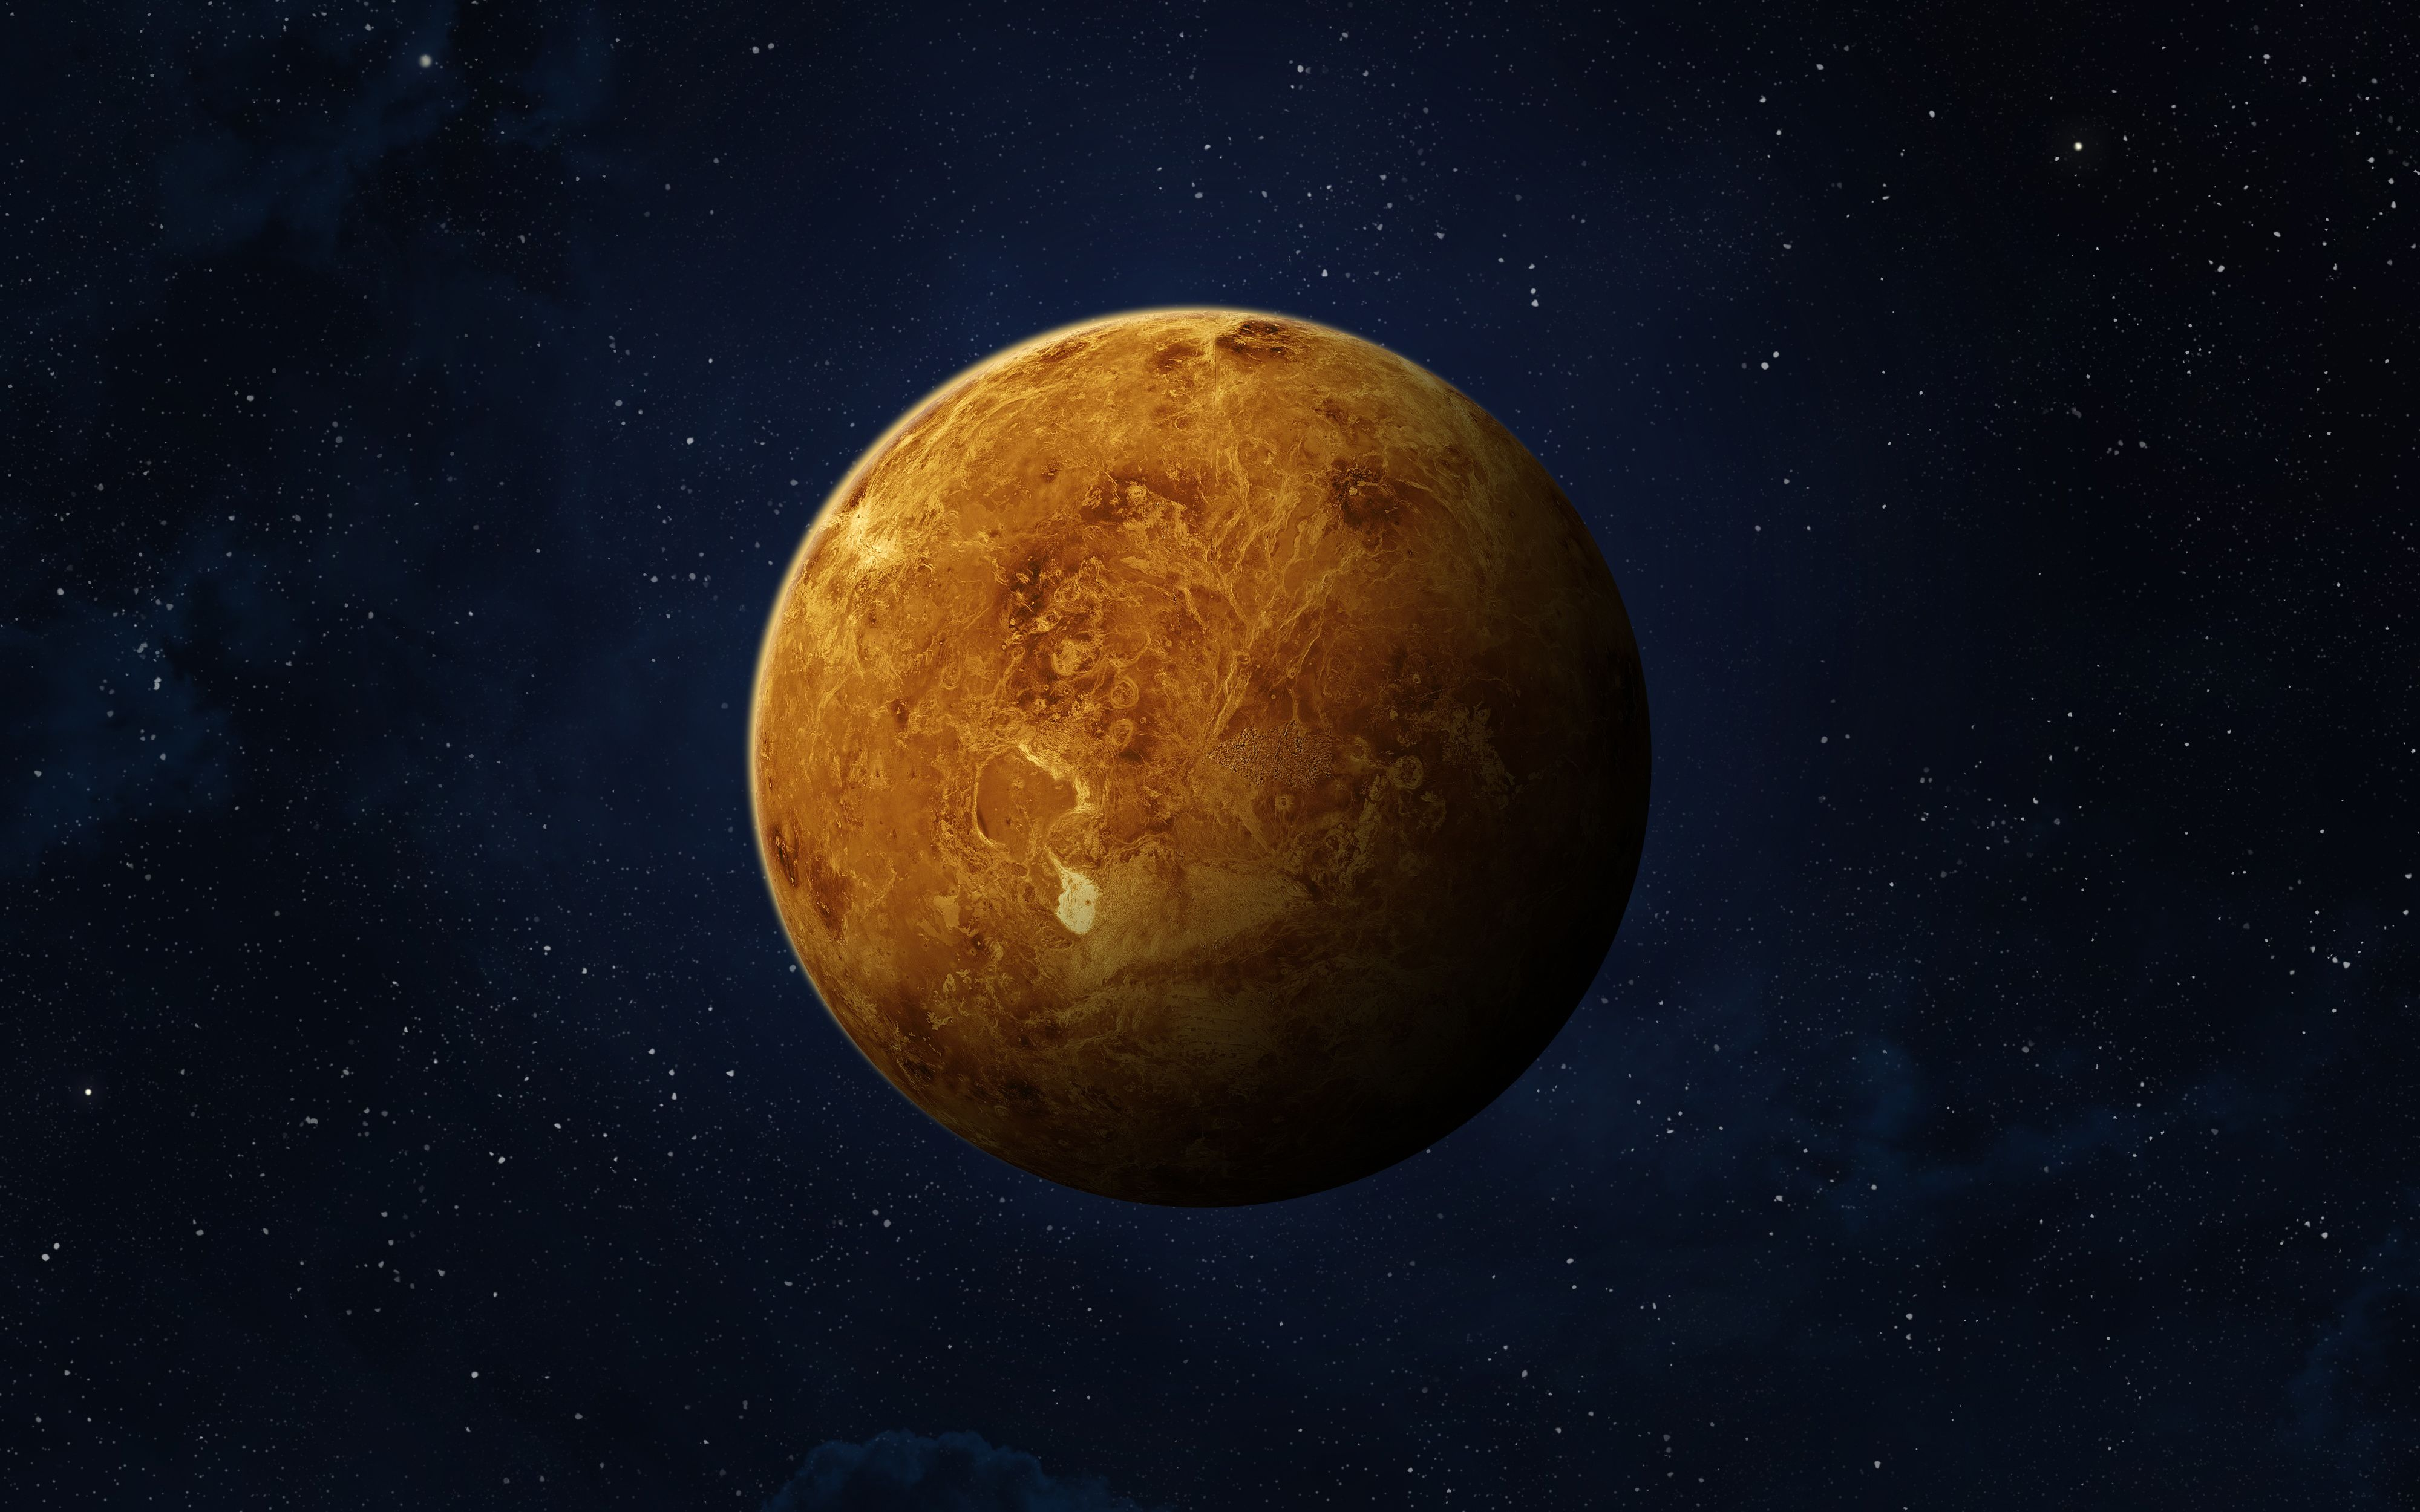 Venus: Exploration, Research and Colonization (Part IV)